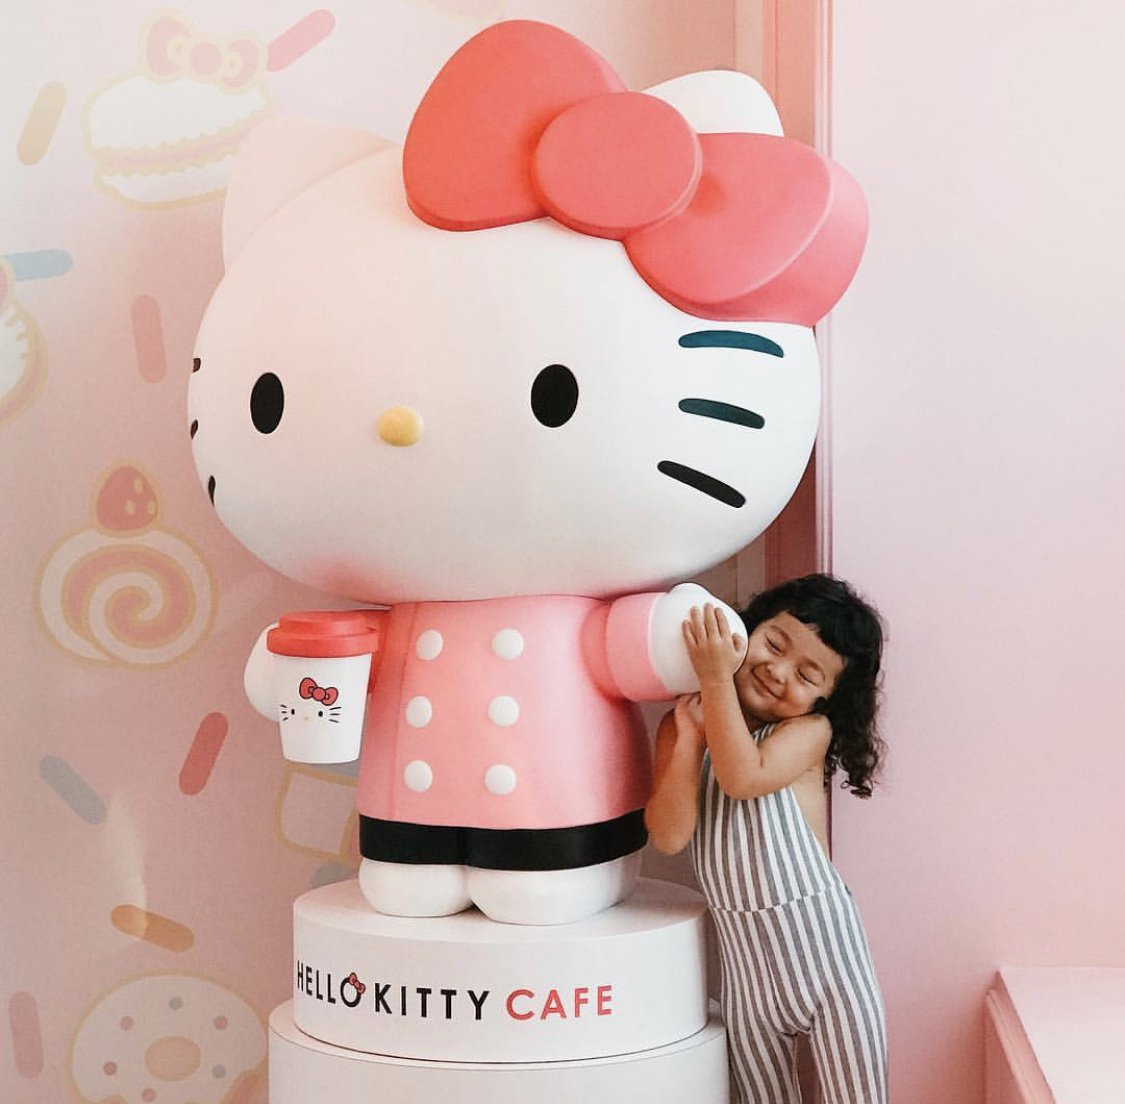 Hello Kitty Cafe's photo on #NationalMakeAFriendDay